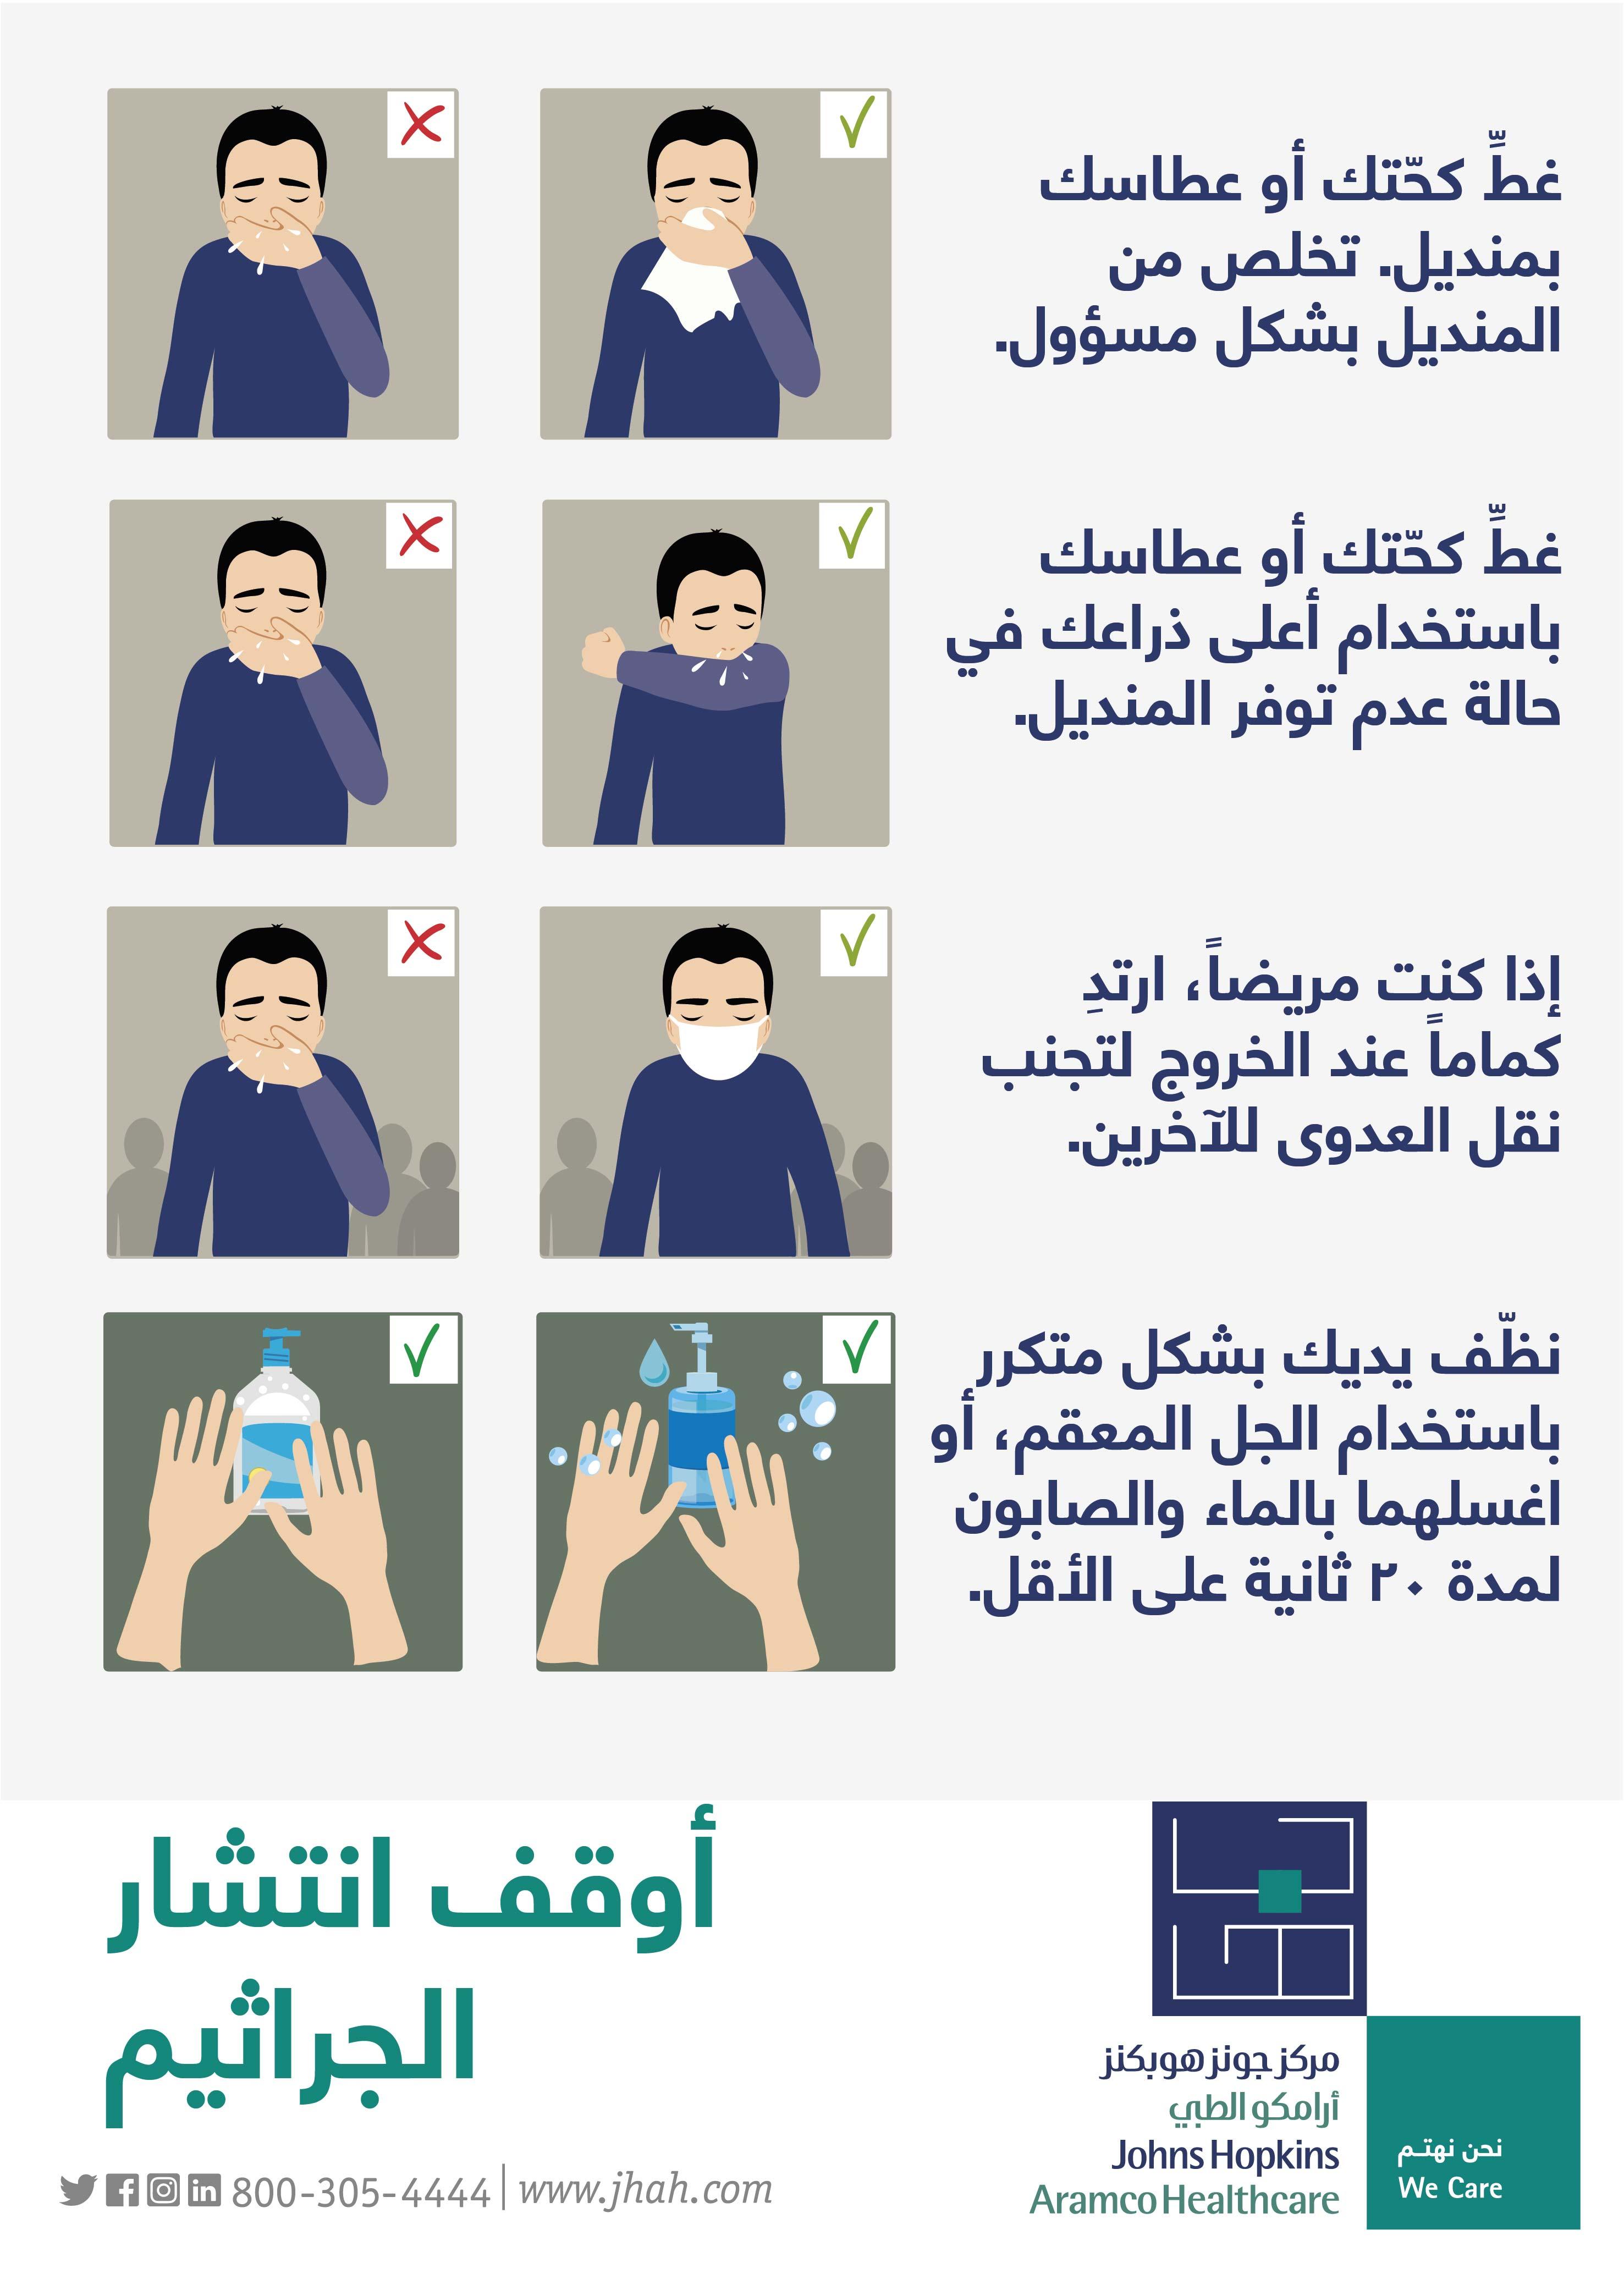 https://www.jhah.com/media/2914/news-novel-coronavirus-2019-ncov-stop-the-spread-arabic.jpg